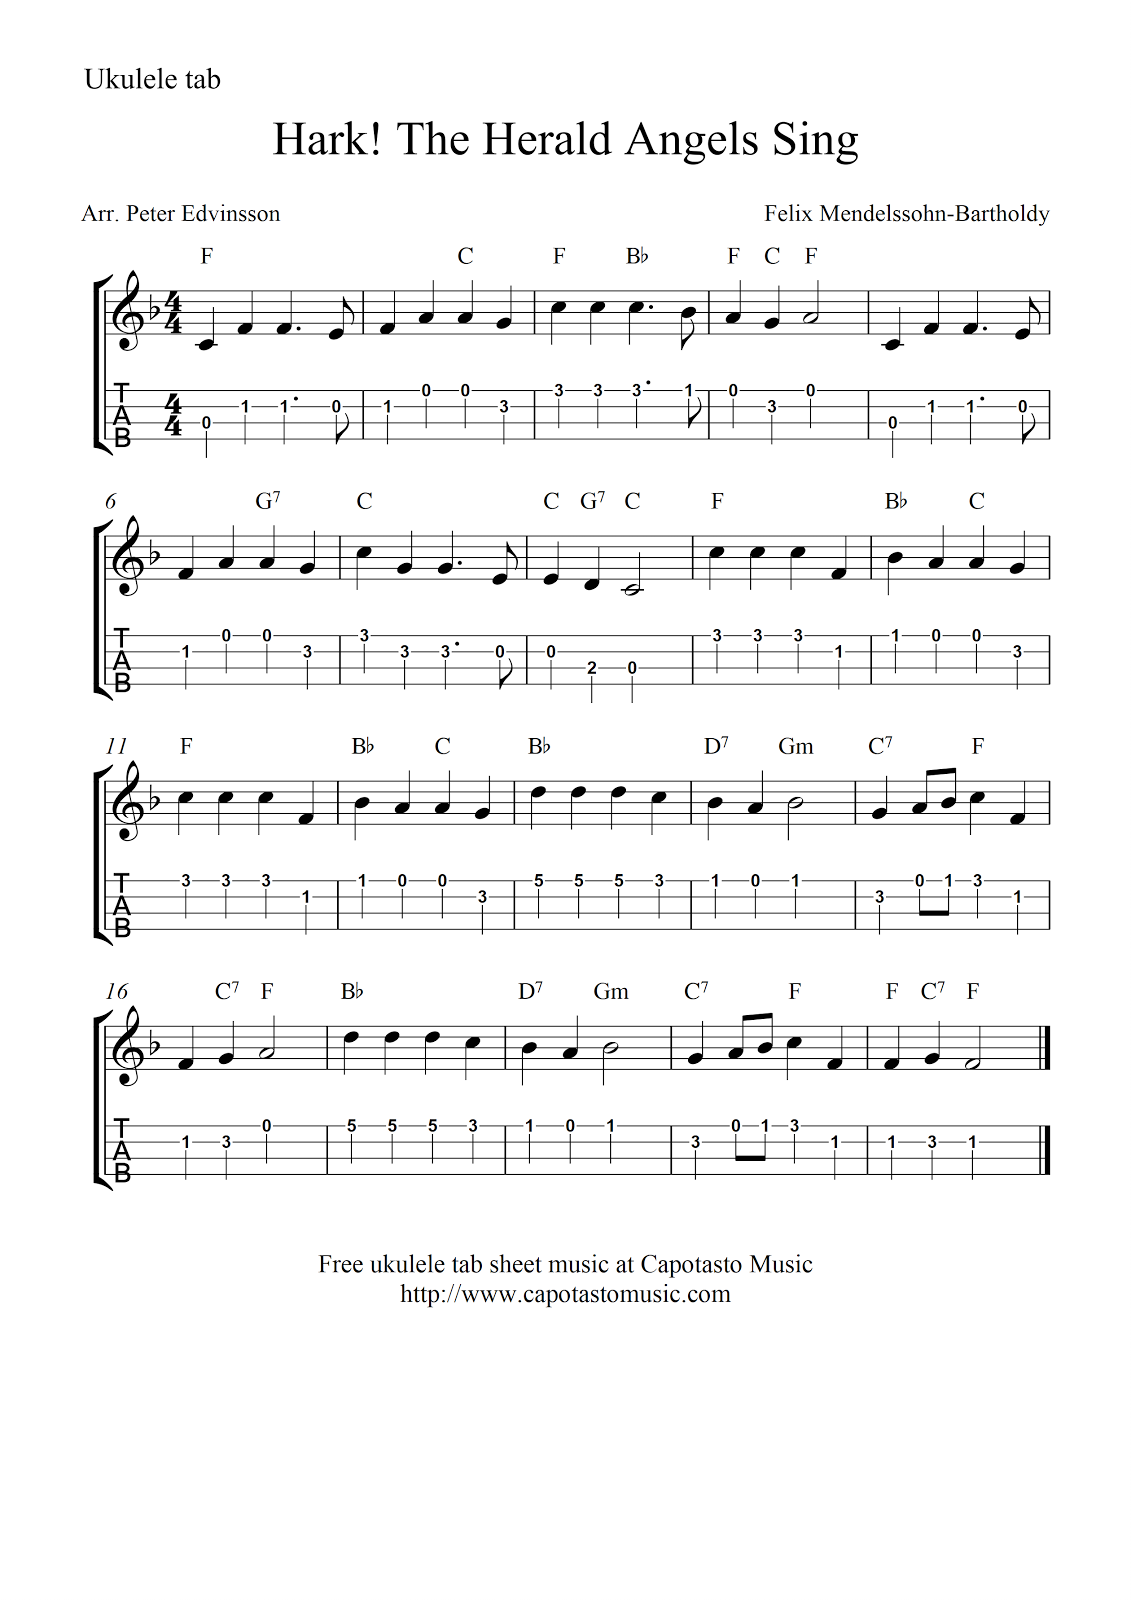 Hark the herald angels sing ukuleleg 11311600 ukulele hark the herald angels sing ukuleleg 1131 hexwebz Image collections